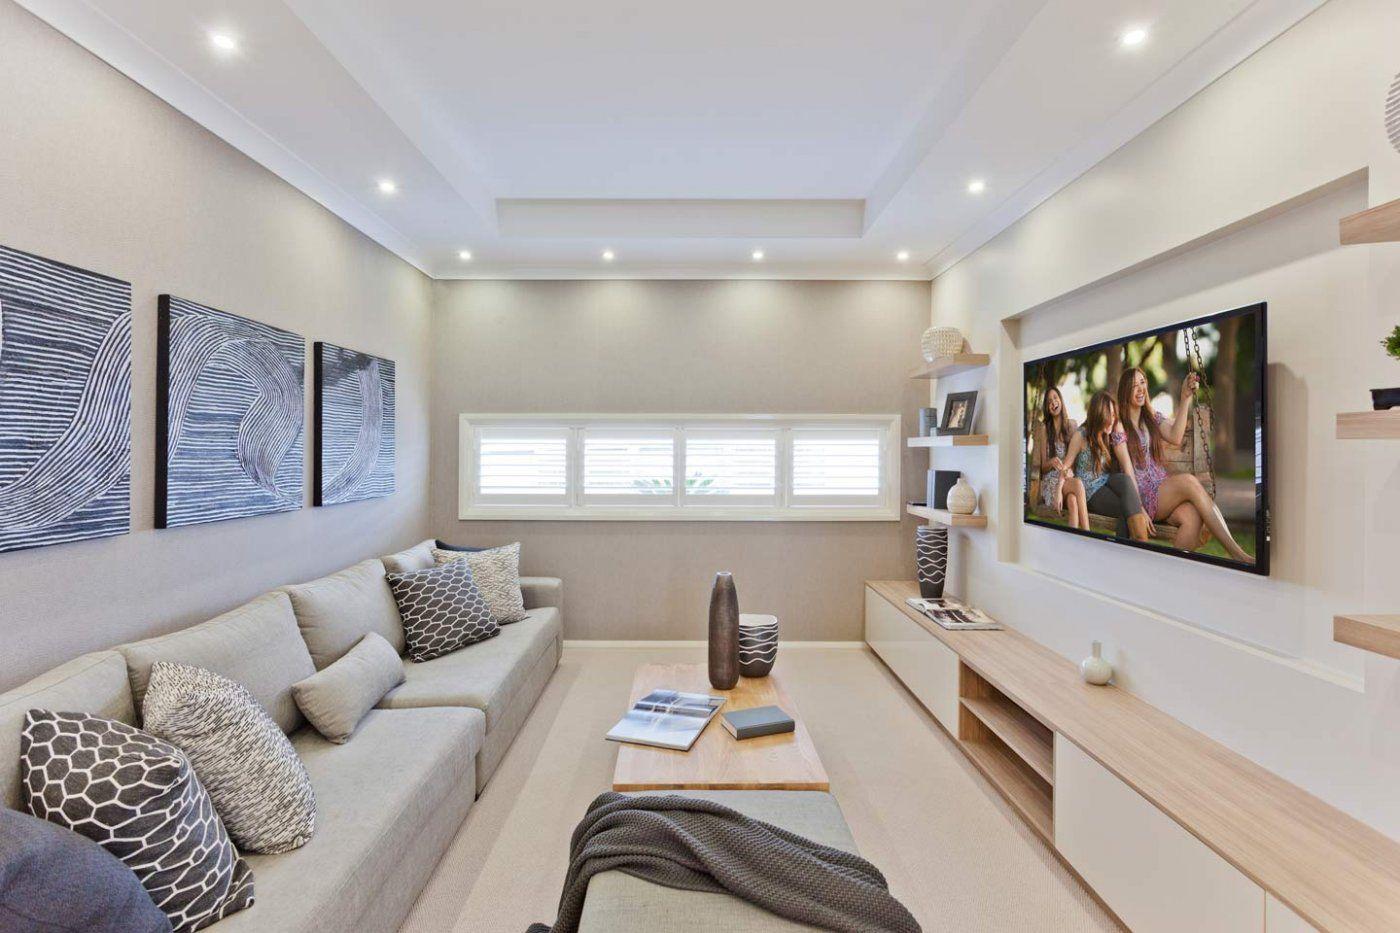 Essington - Images | McDonald Jones Homes | Home ideas | Pinterest ...